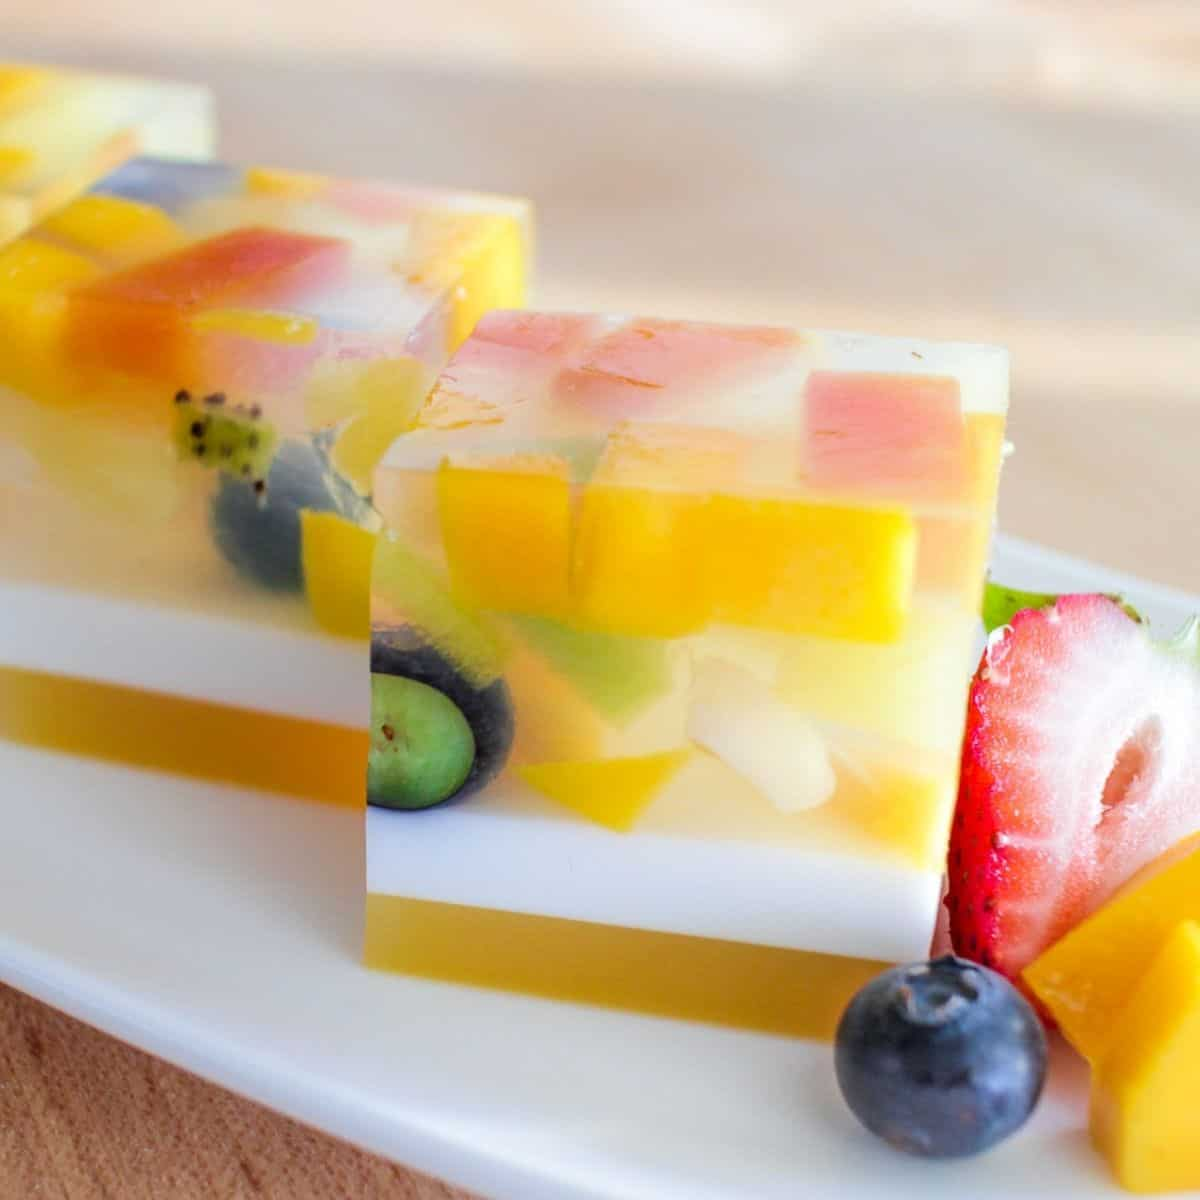 A plate of agar fruit jelly cubes